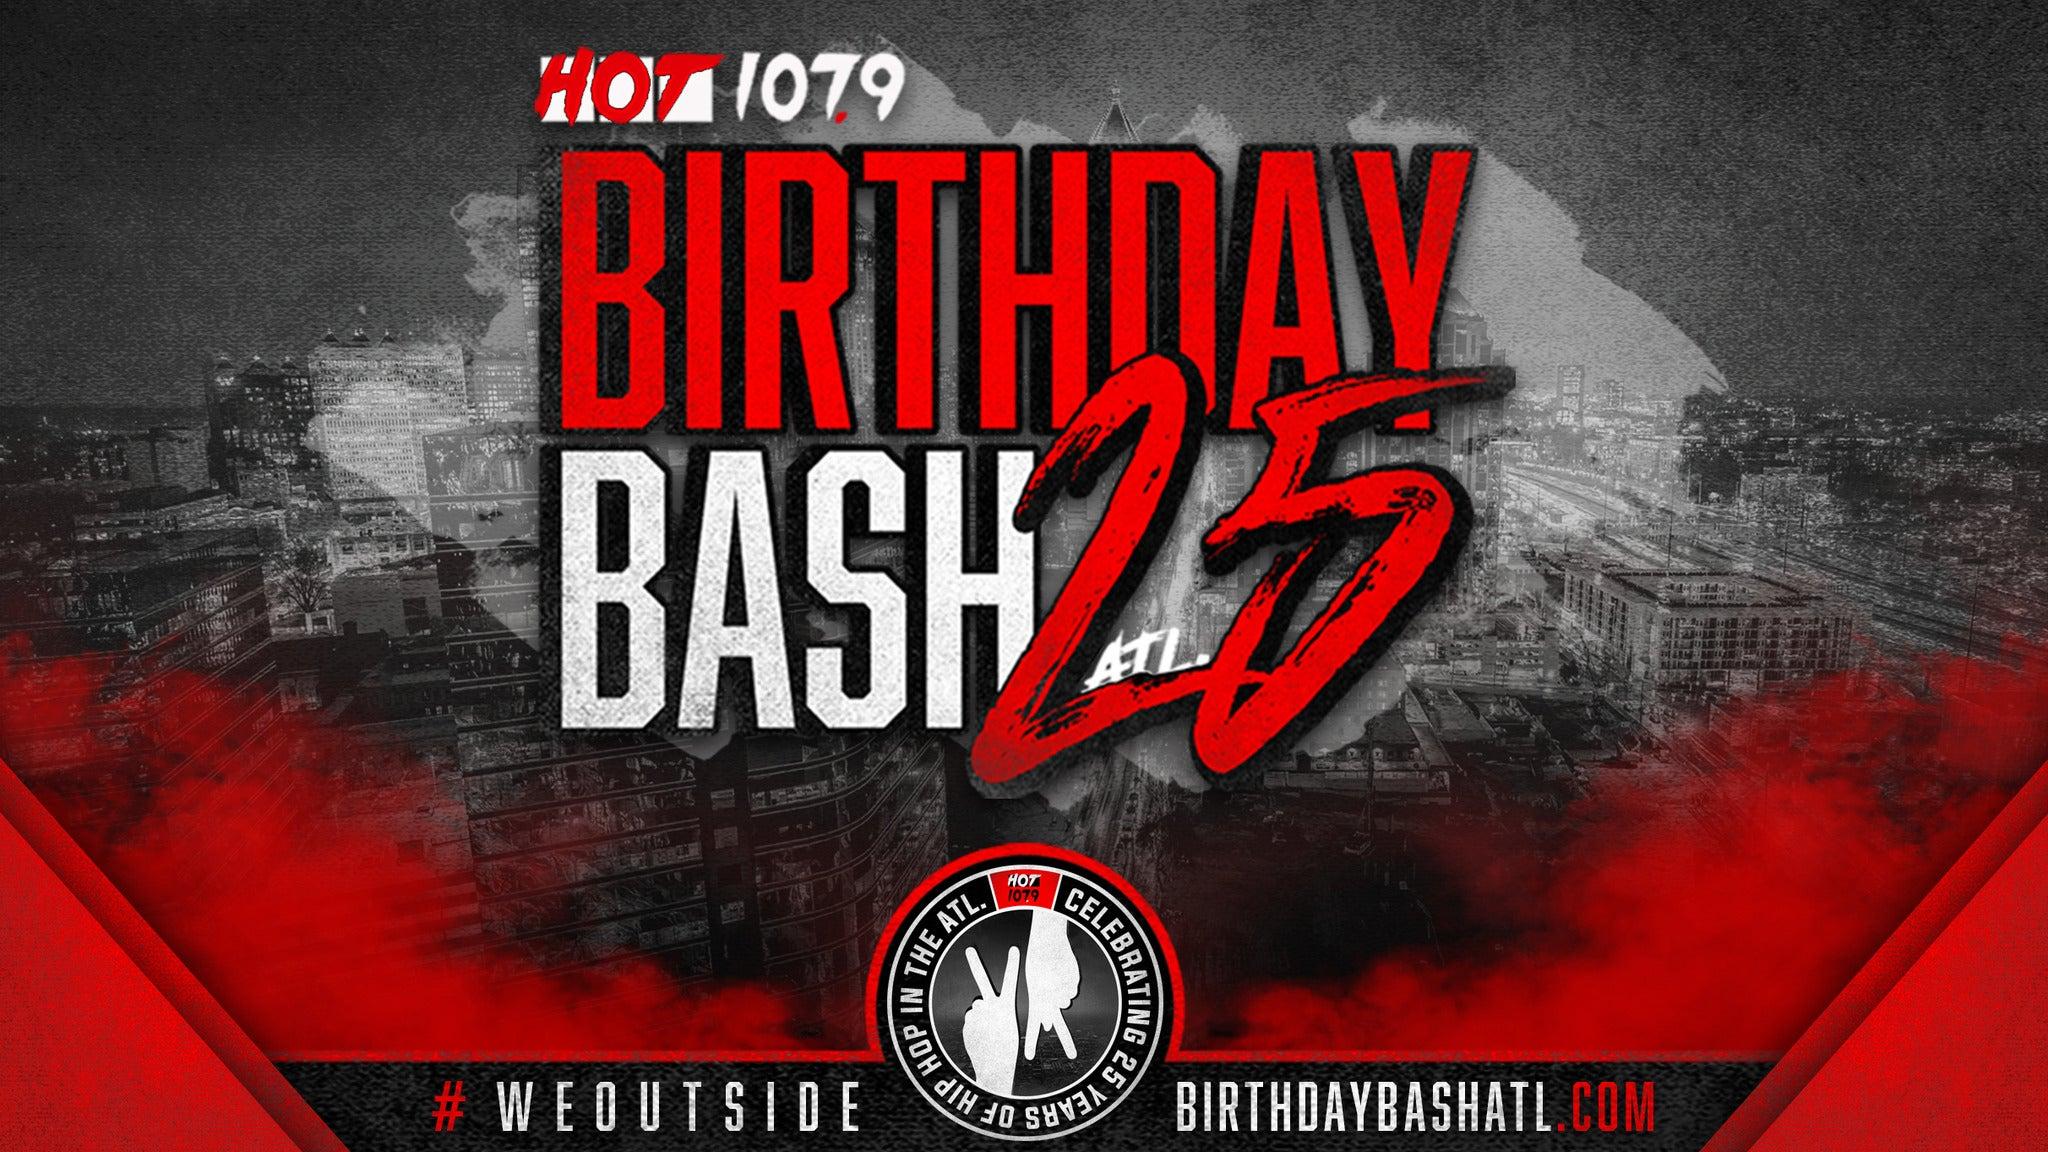 Hot 107.9 Birthday Bash presale password